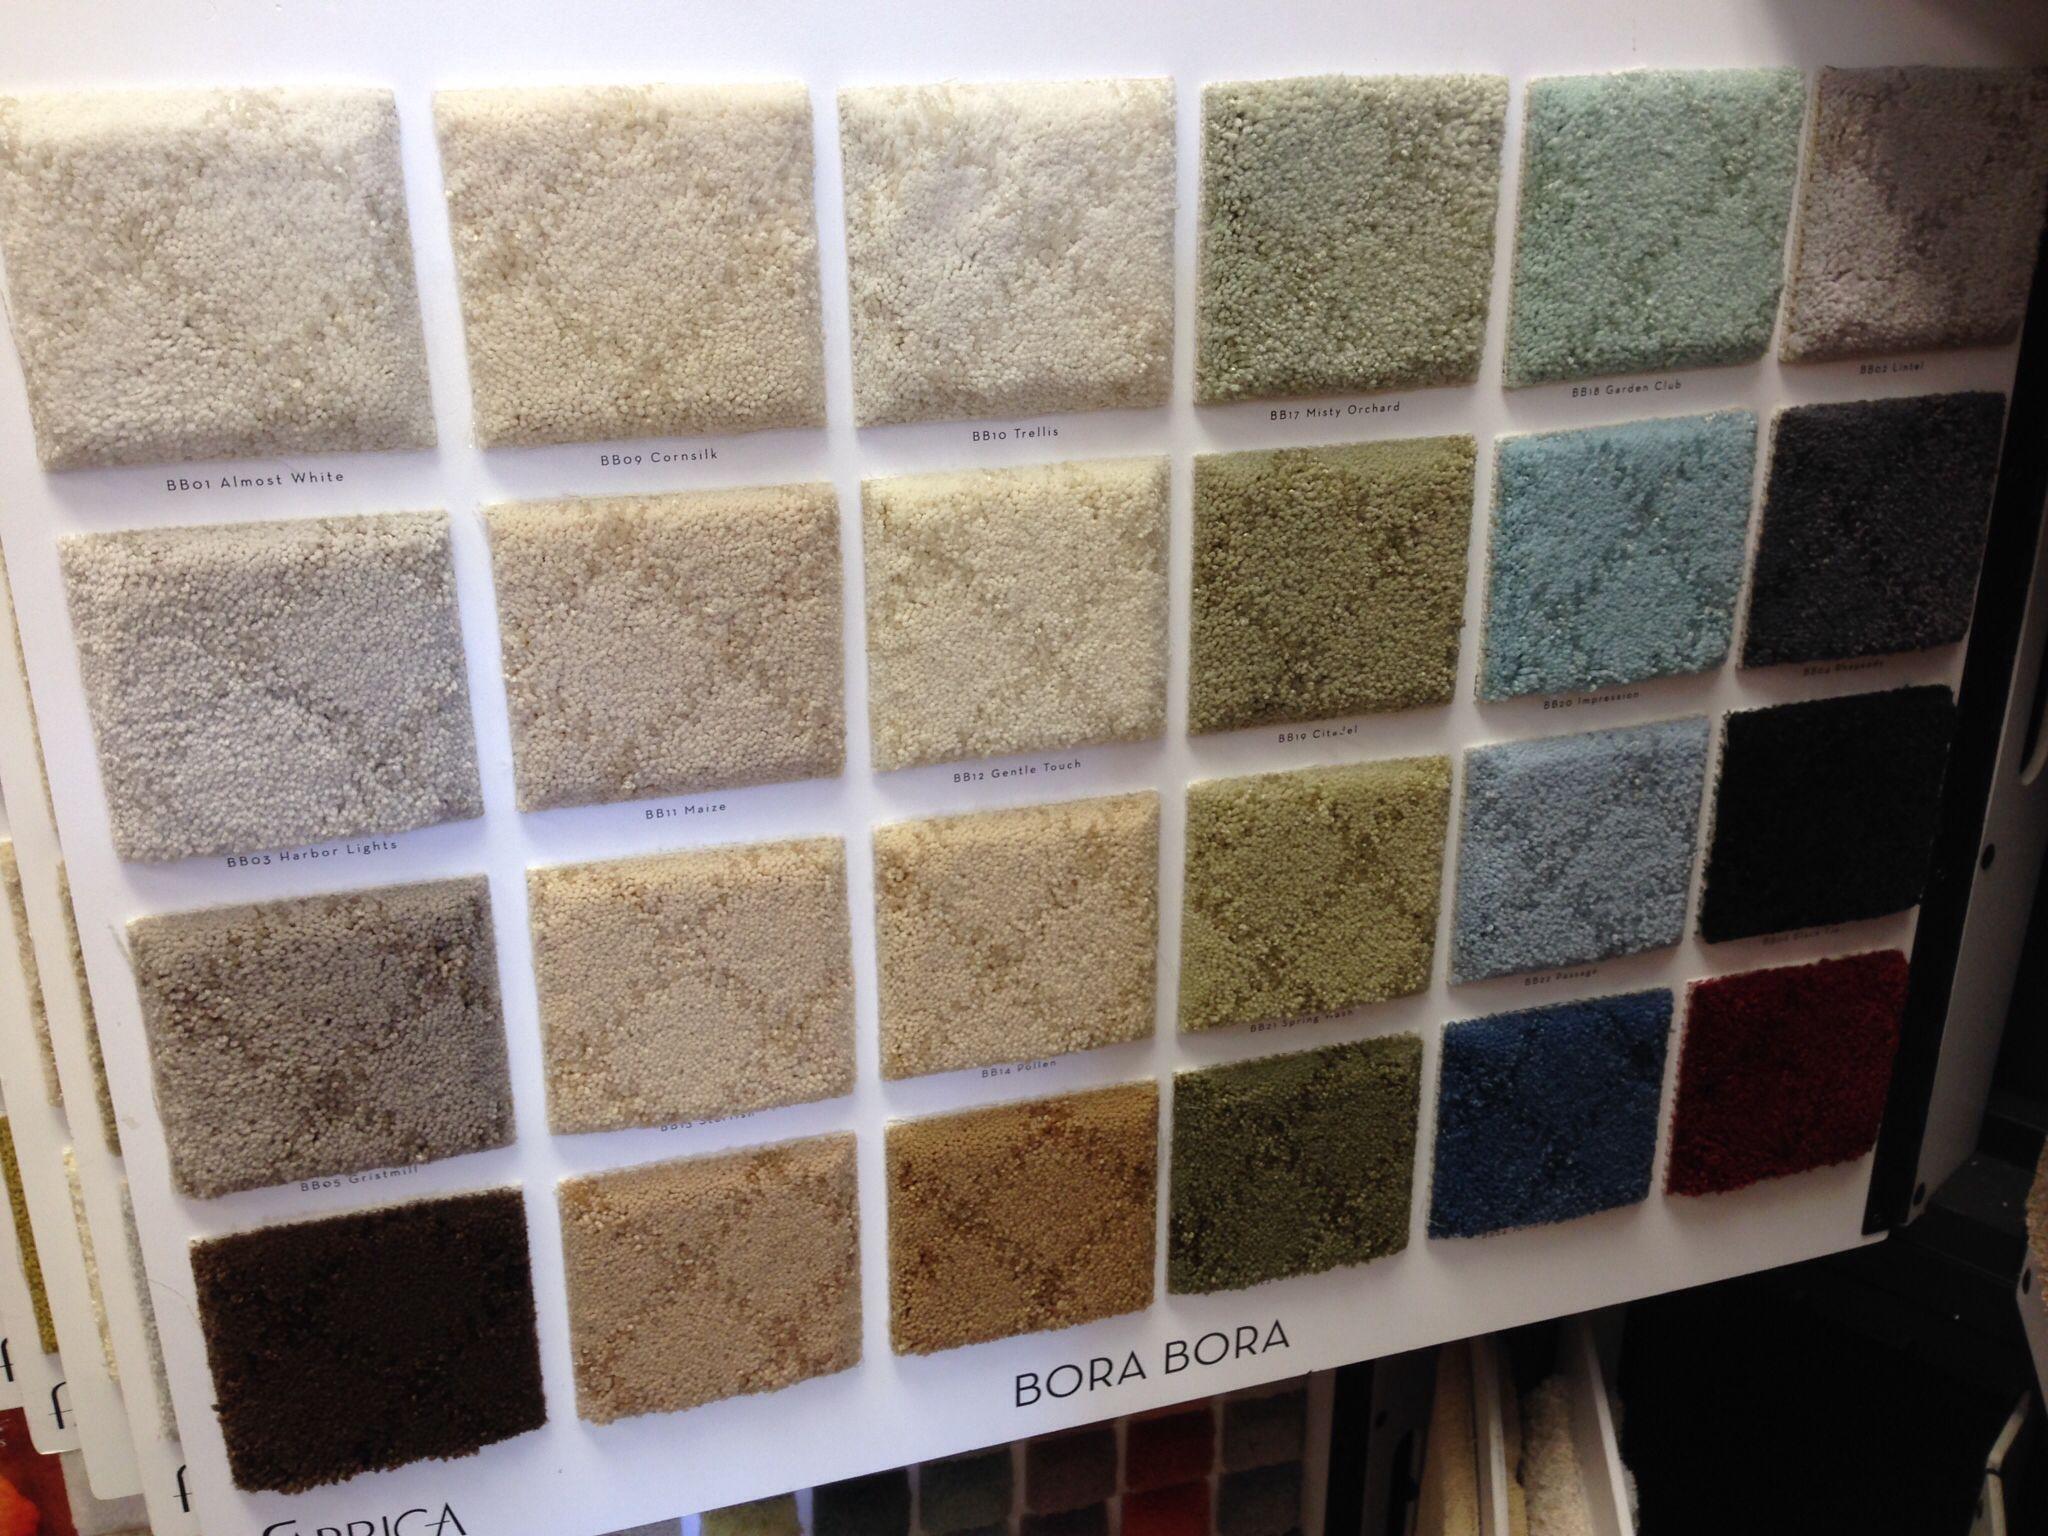 Contract Carpet Fabrica Bora Bora Carpet Pinterest